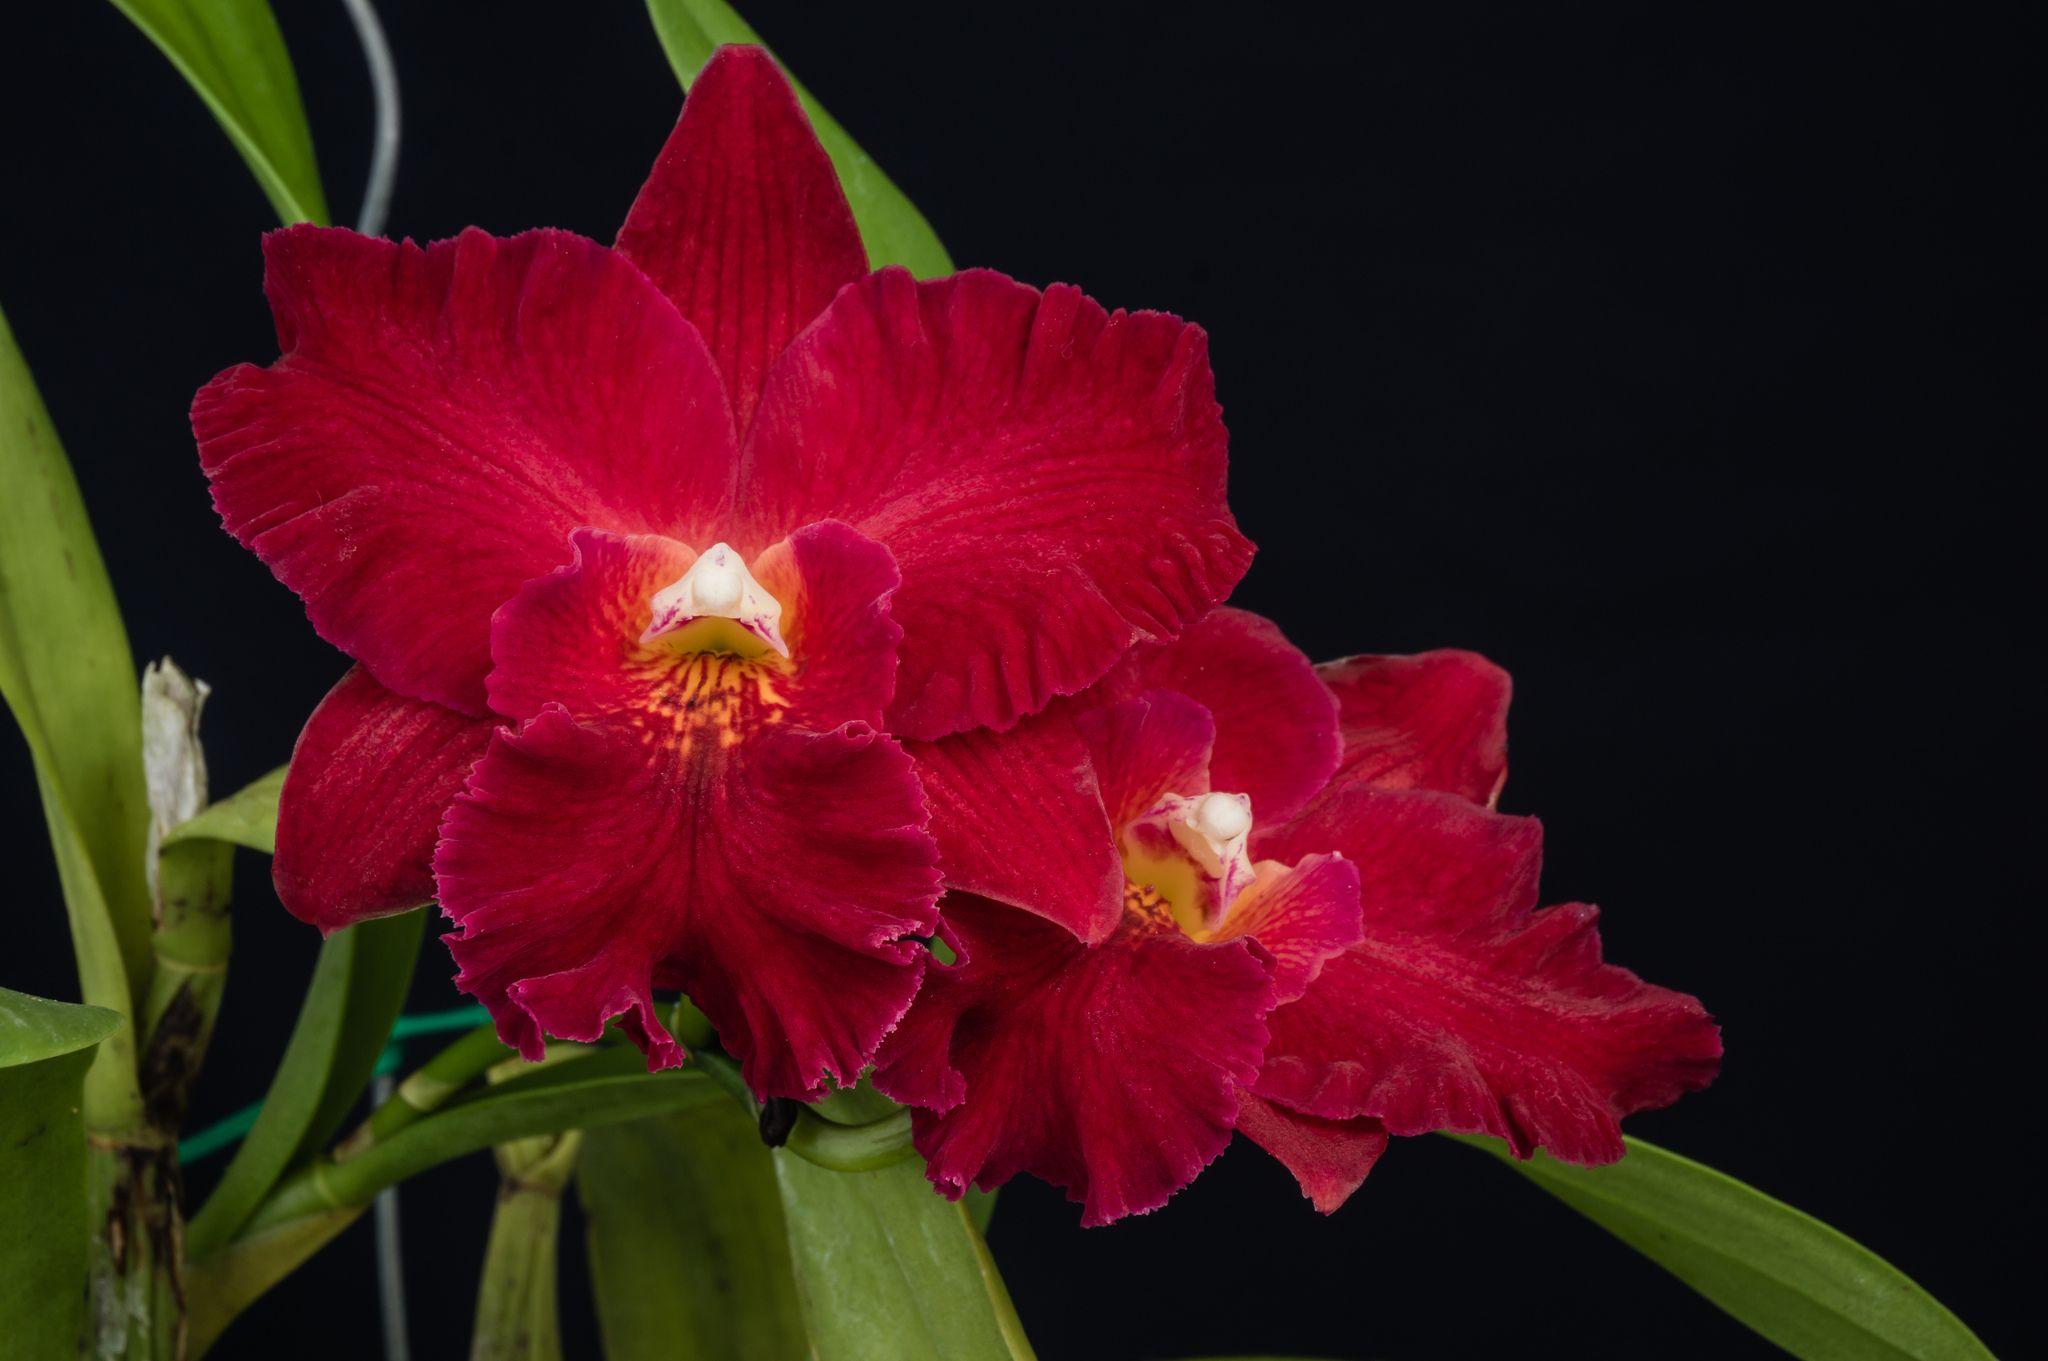 Inter-generic Orchid-hybrid: Hasegawaara Red Stella 'Carmela' - Flickr - Photo Sharing!